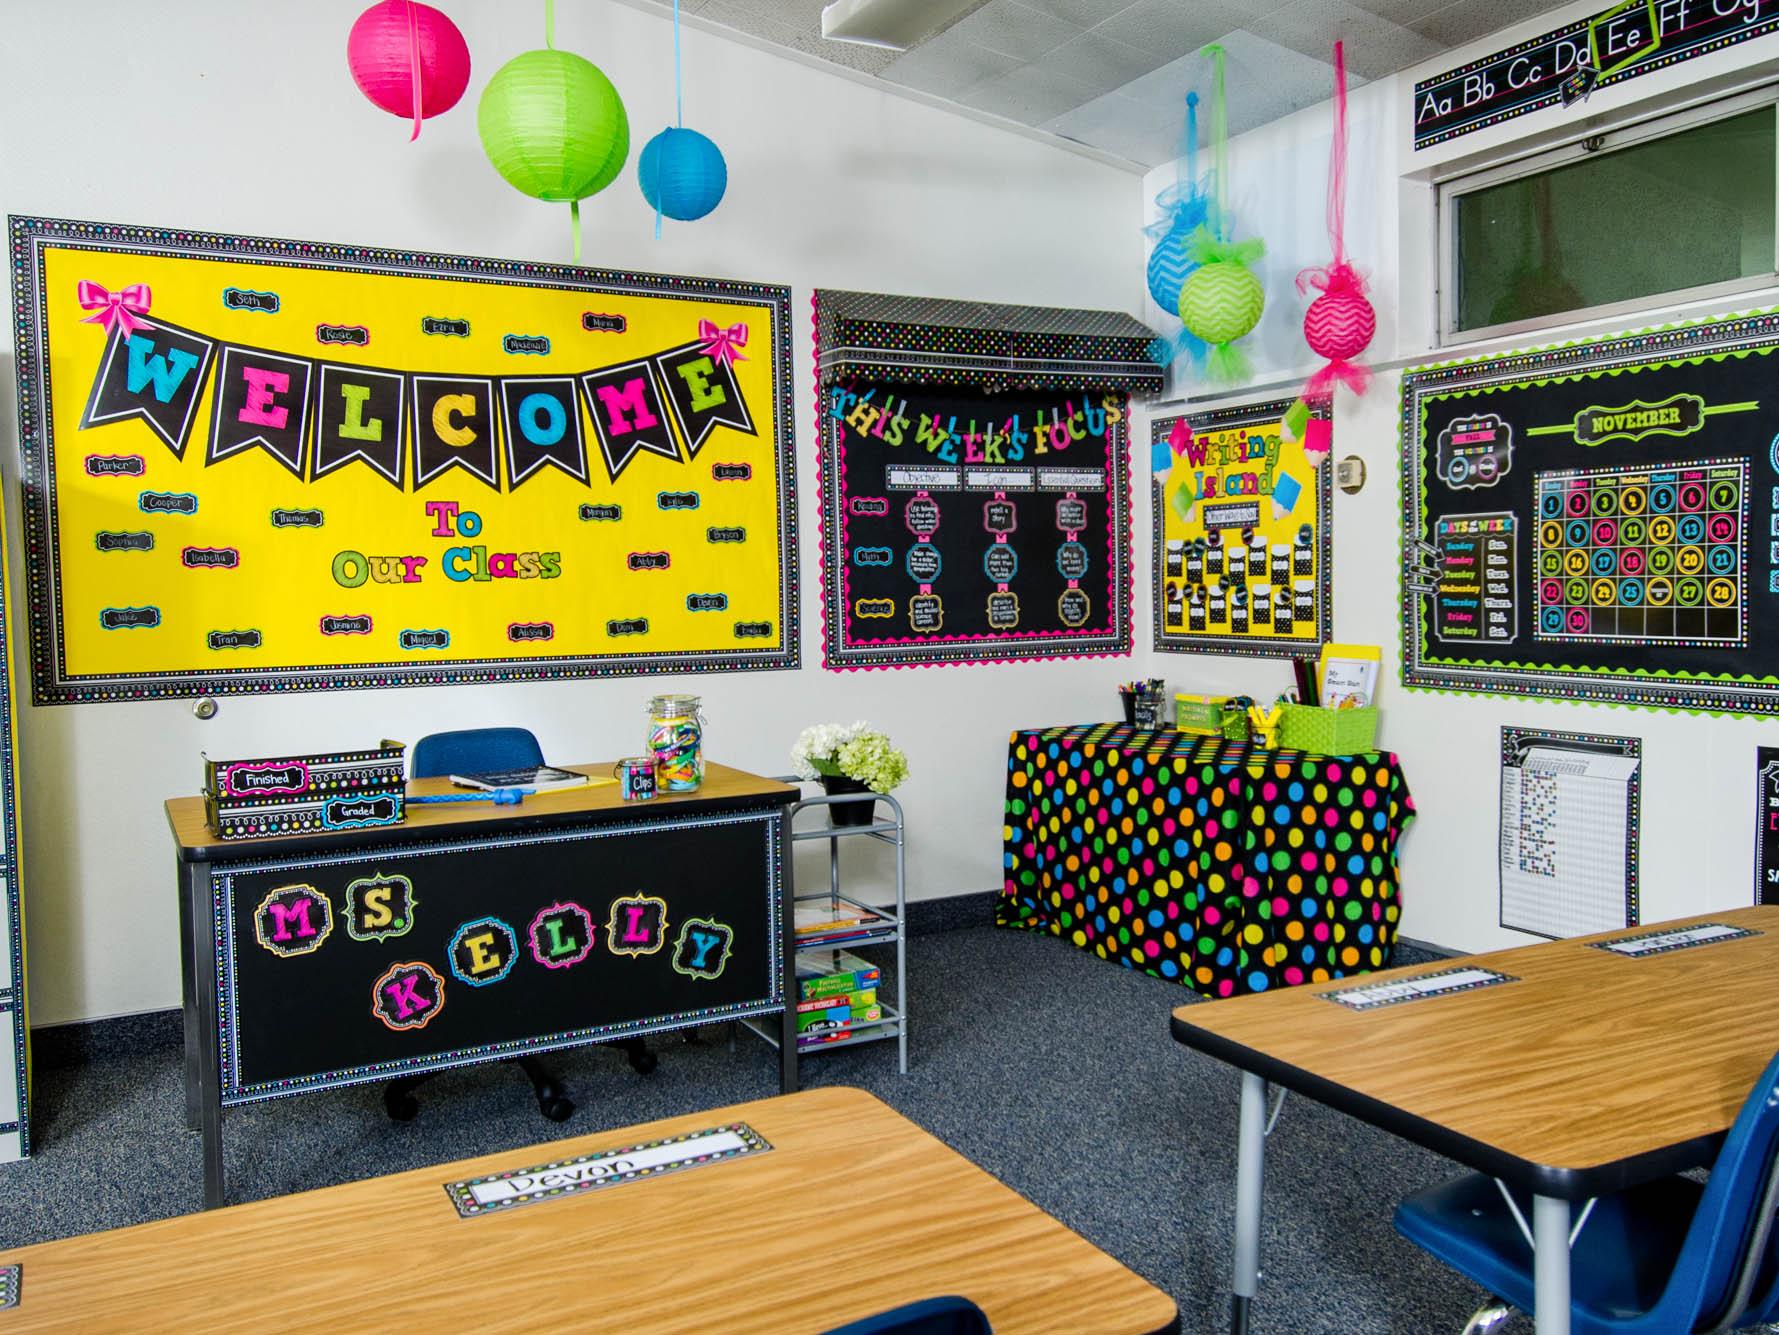 Colorful Classrooms | The PediaBlog